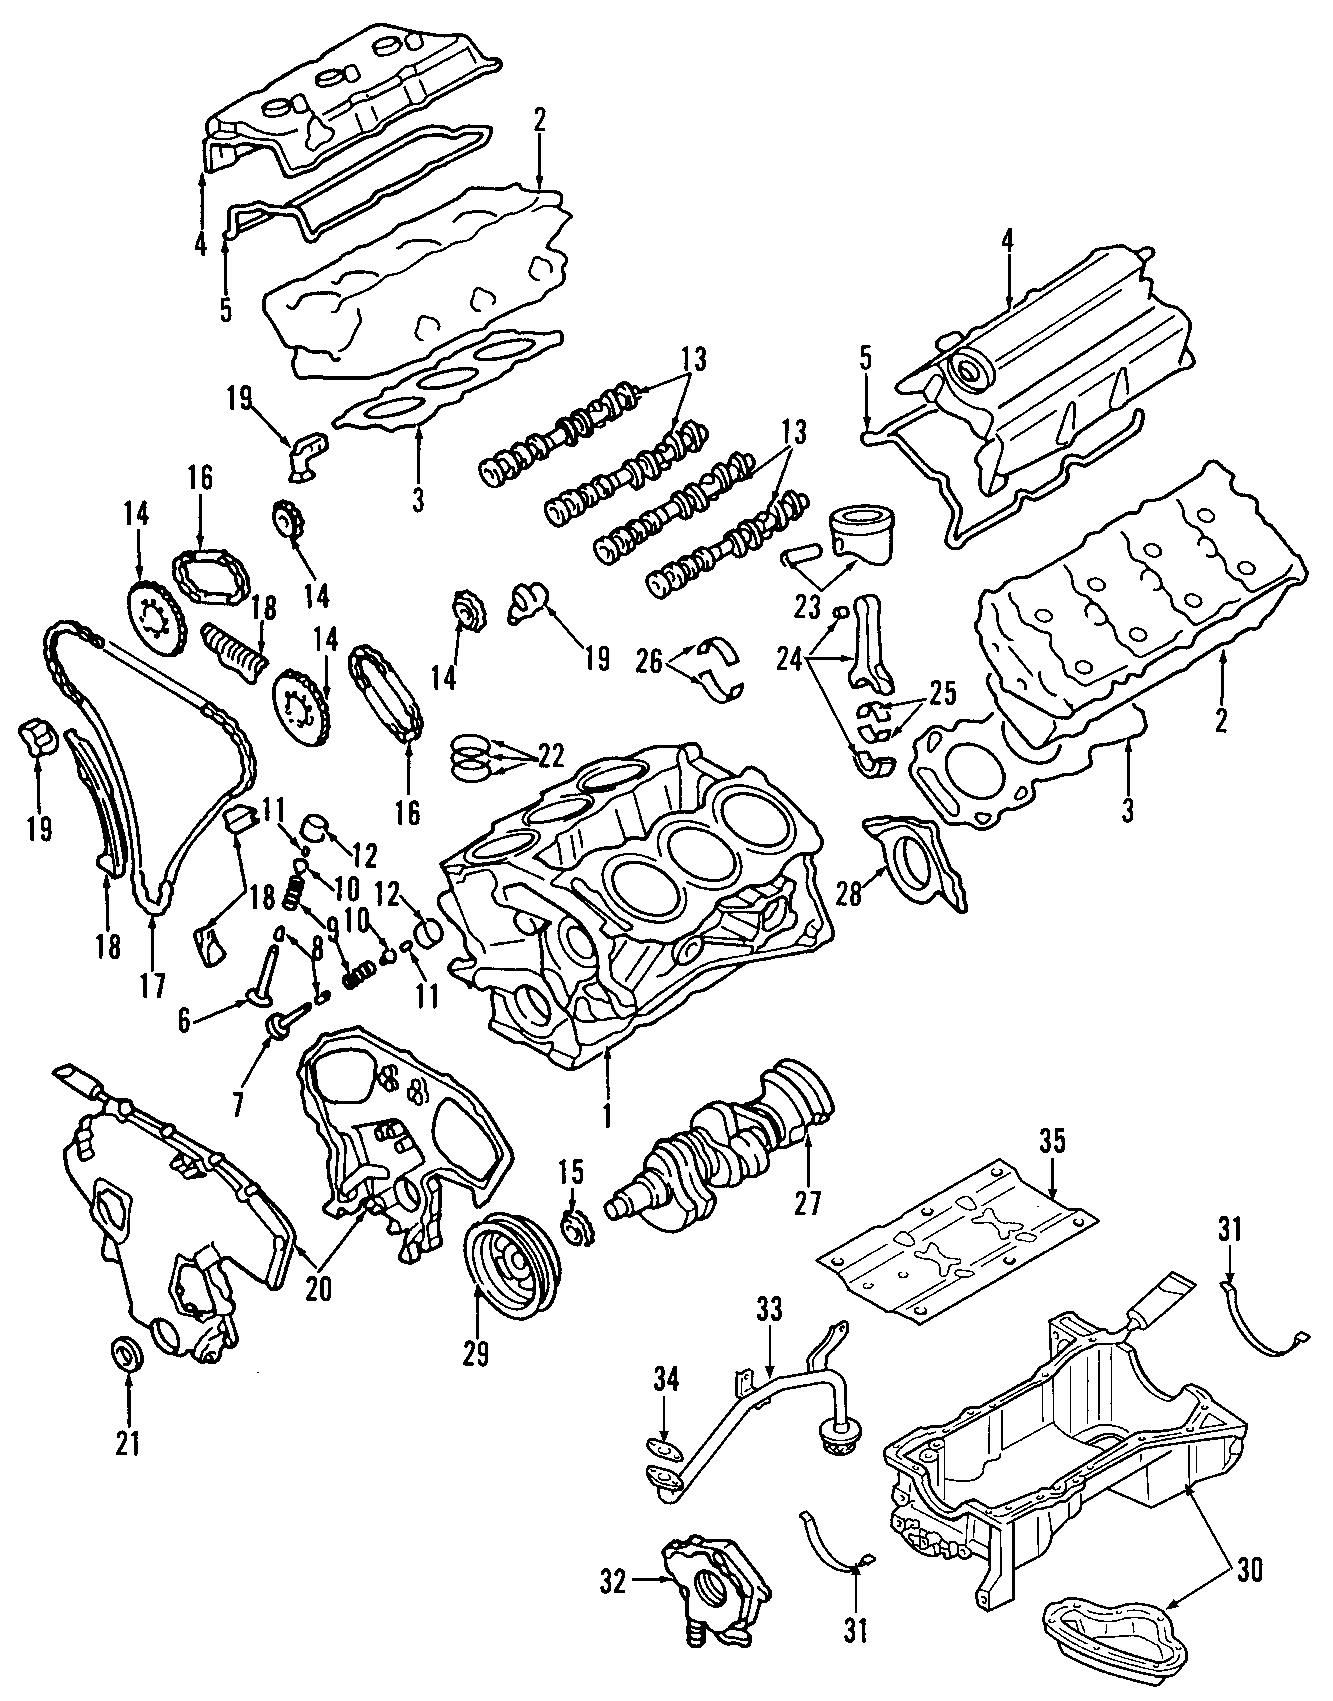 Nissan Quest Engine Cylinder Head